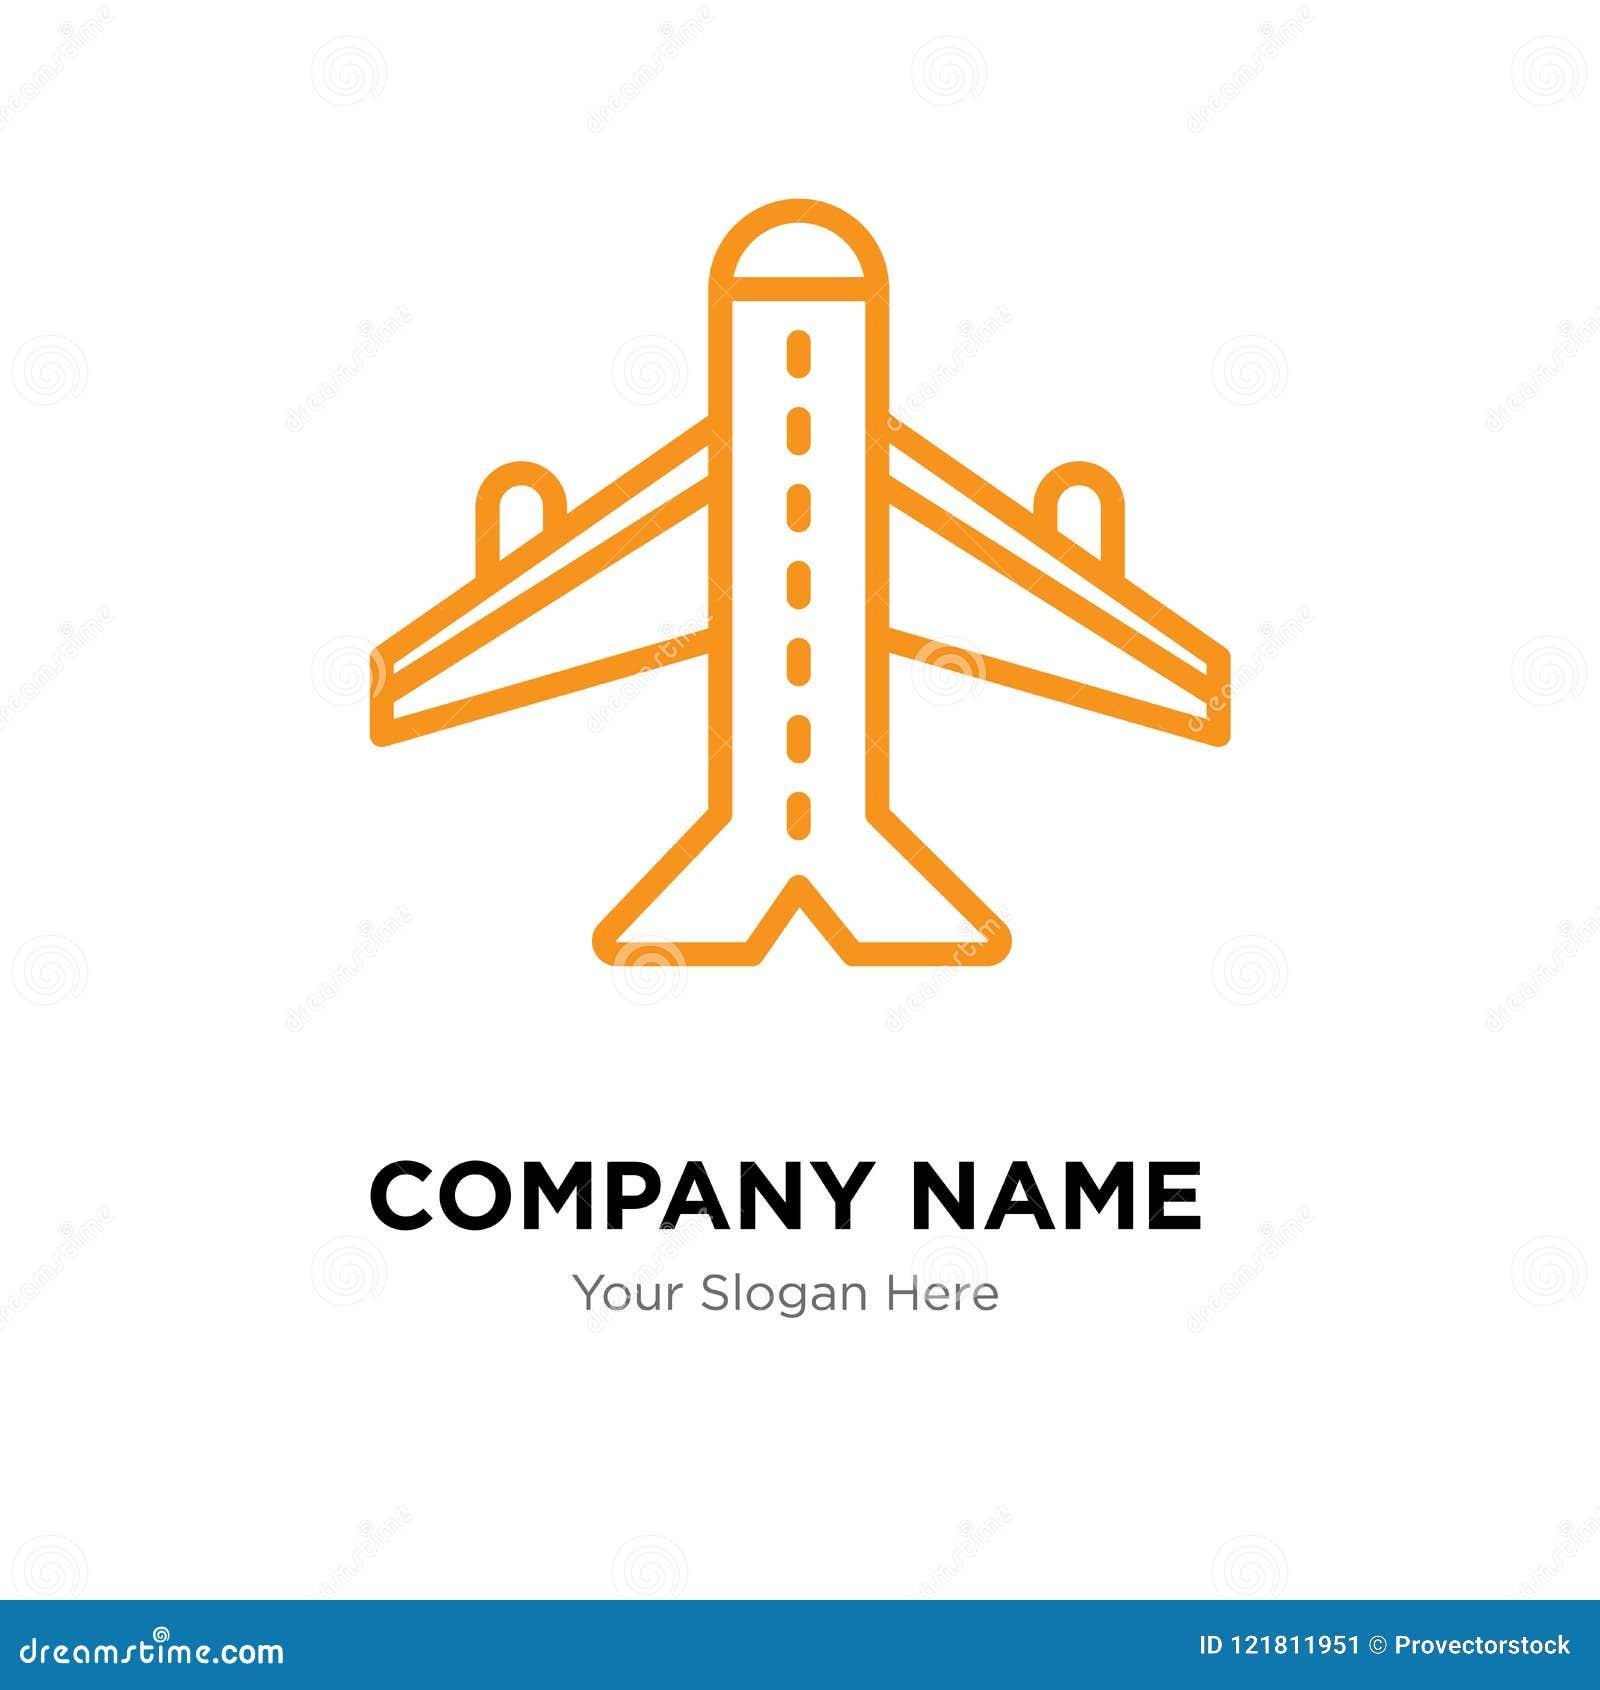 plane company logo design stock vector illustration of flight